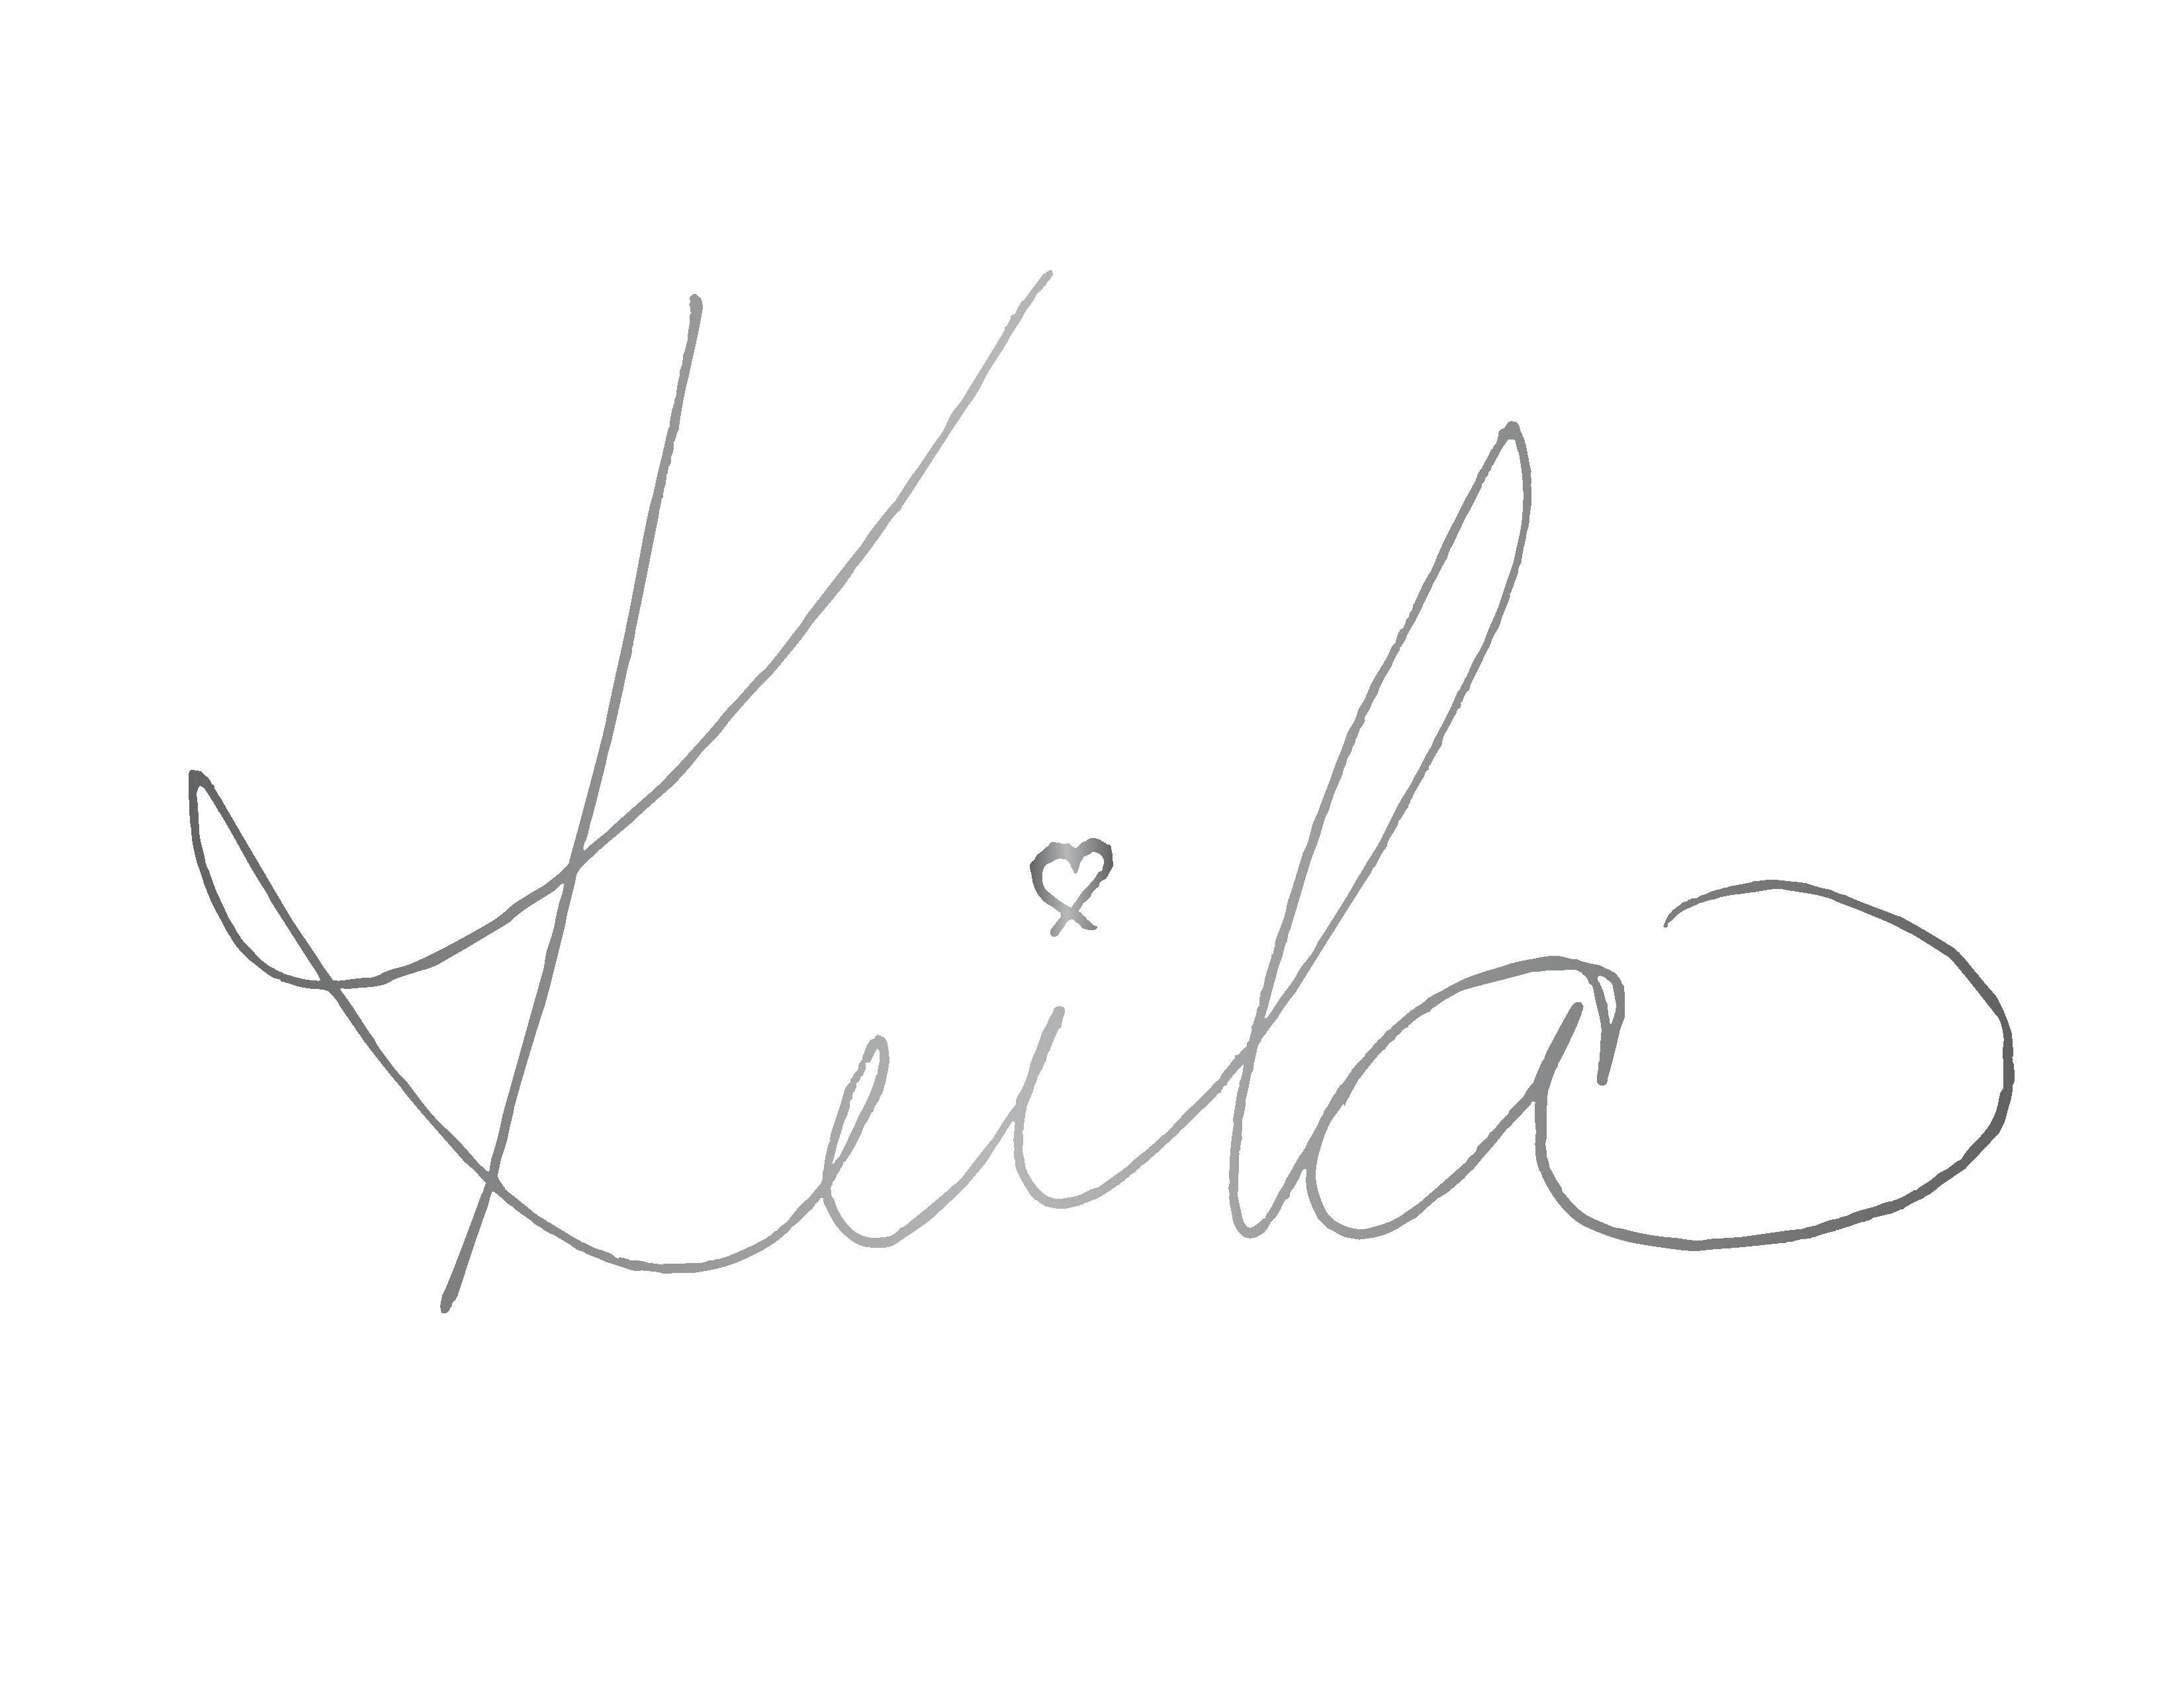 The Keila